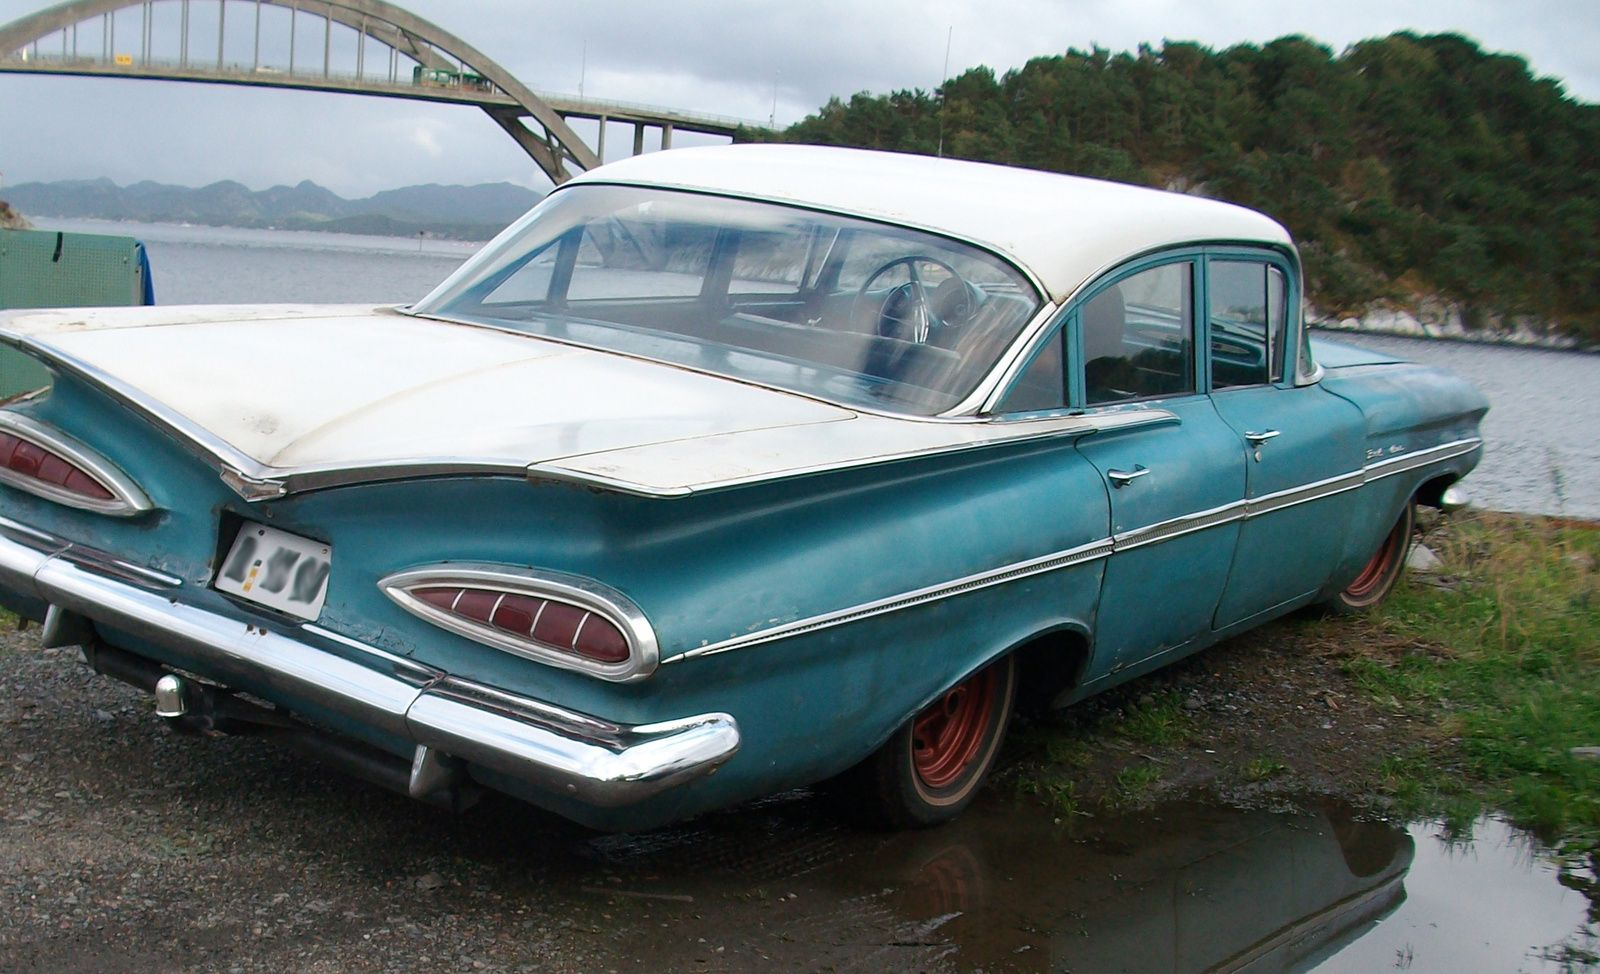 small resolution of 1962 impala chevrolet classic cars pinterest 1962 chevrolet impala 1959 chevrolet bel air wiring diagram